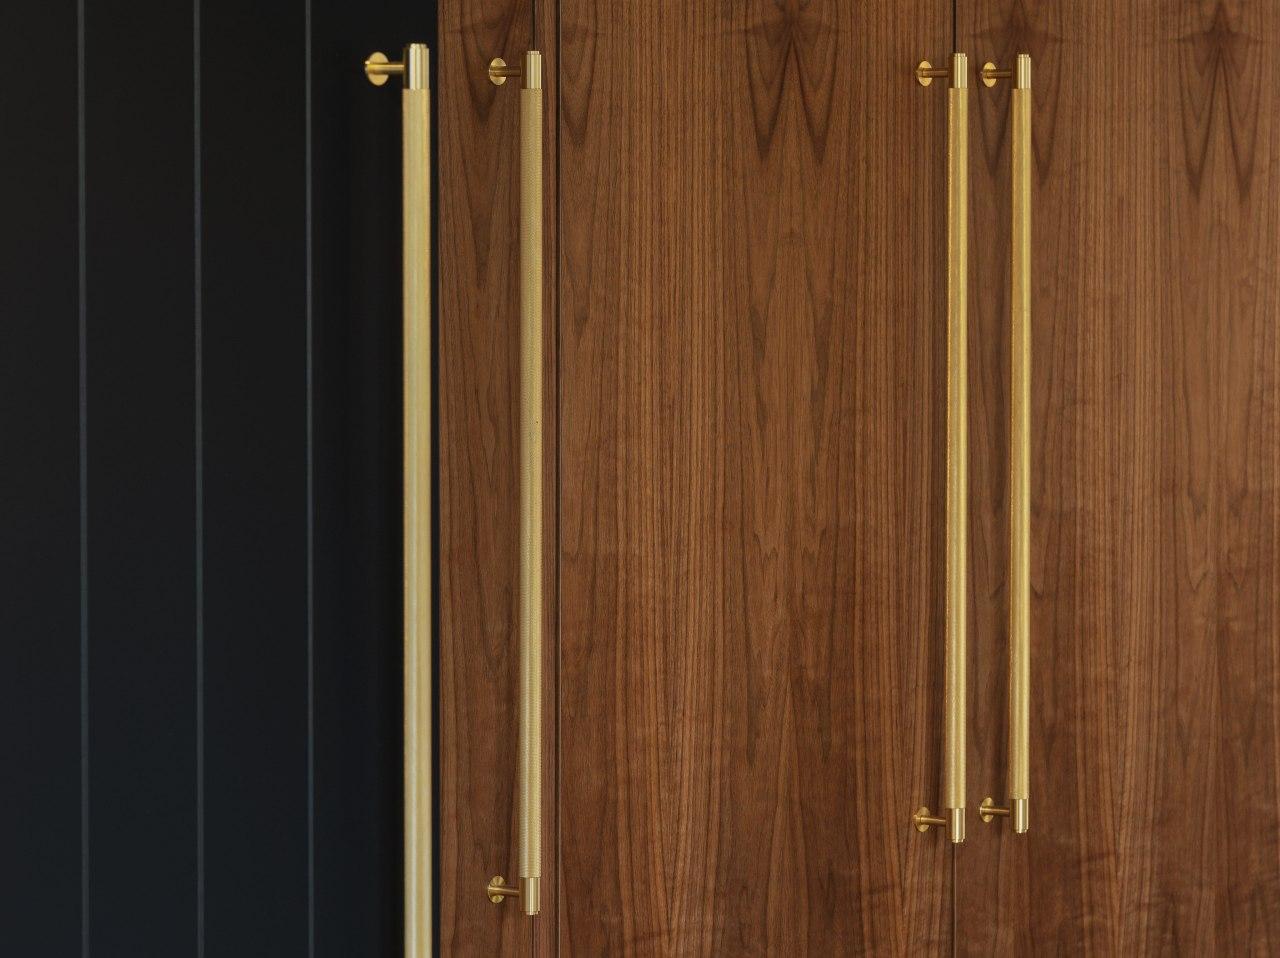 American walnut veneer meets a weatherboard-look barn door